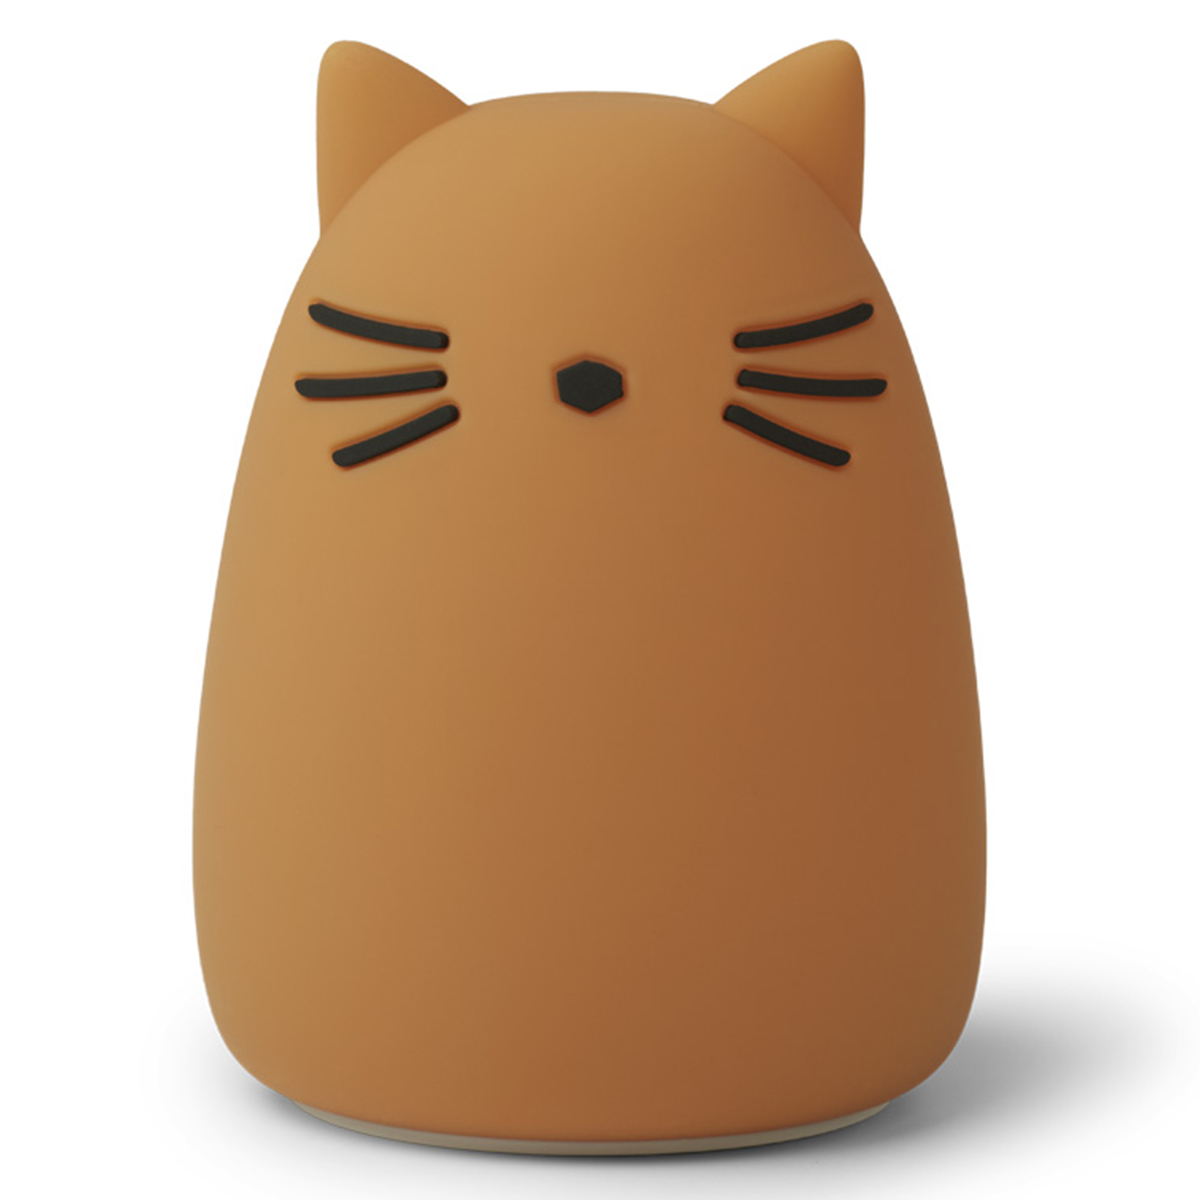 Veilleuse Veilleuse Winston - Cat Mustard Veilleuse Winston - Cat Mustard